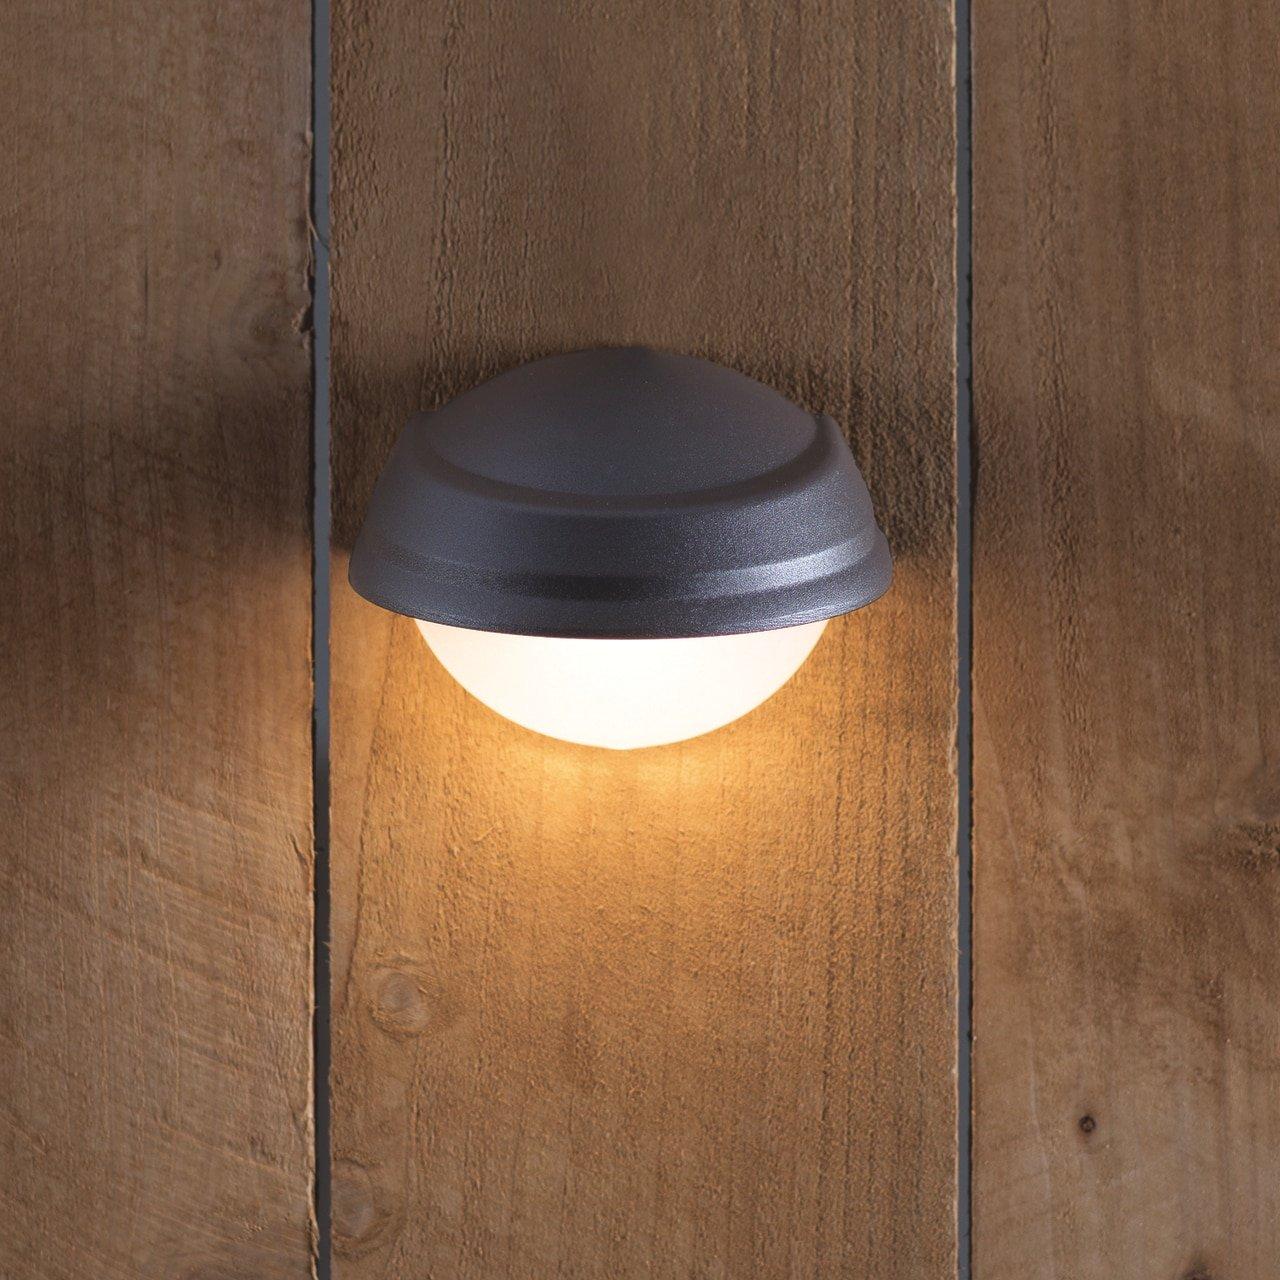 Amazon.com: Better Home and Gardens 1 Piece QuickFIT LED Deck Light ...